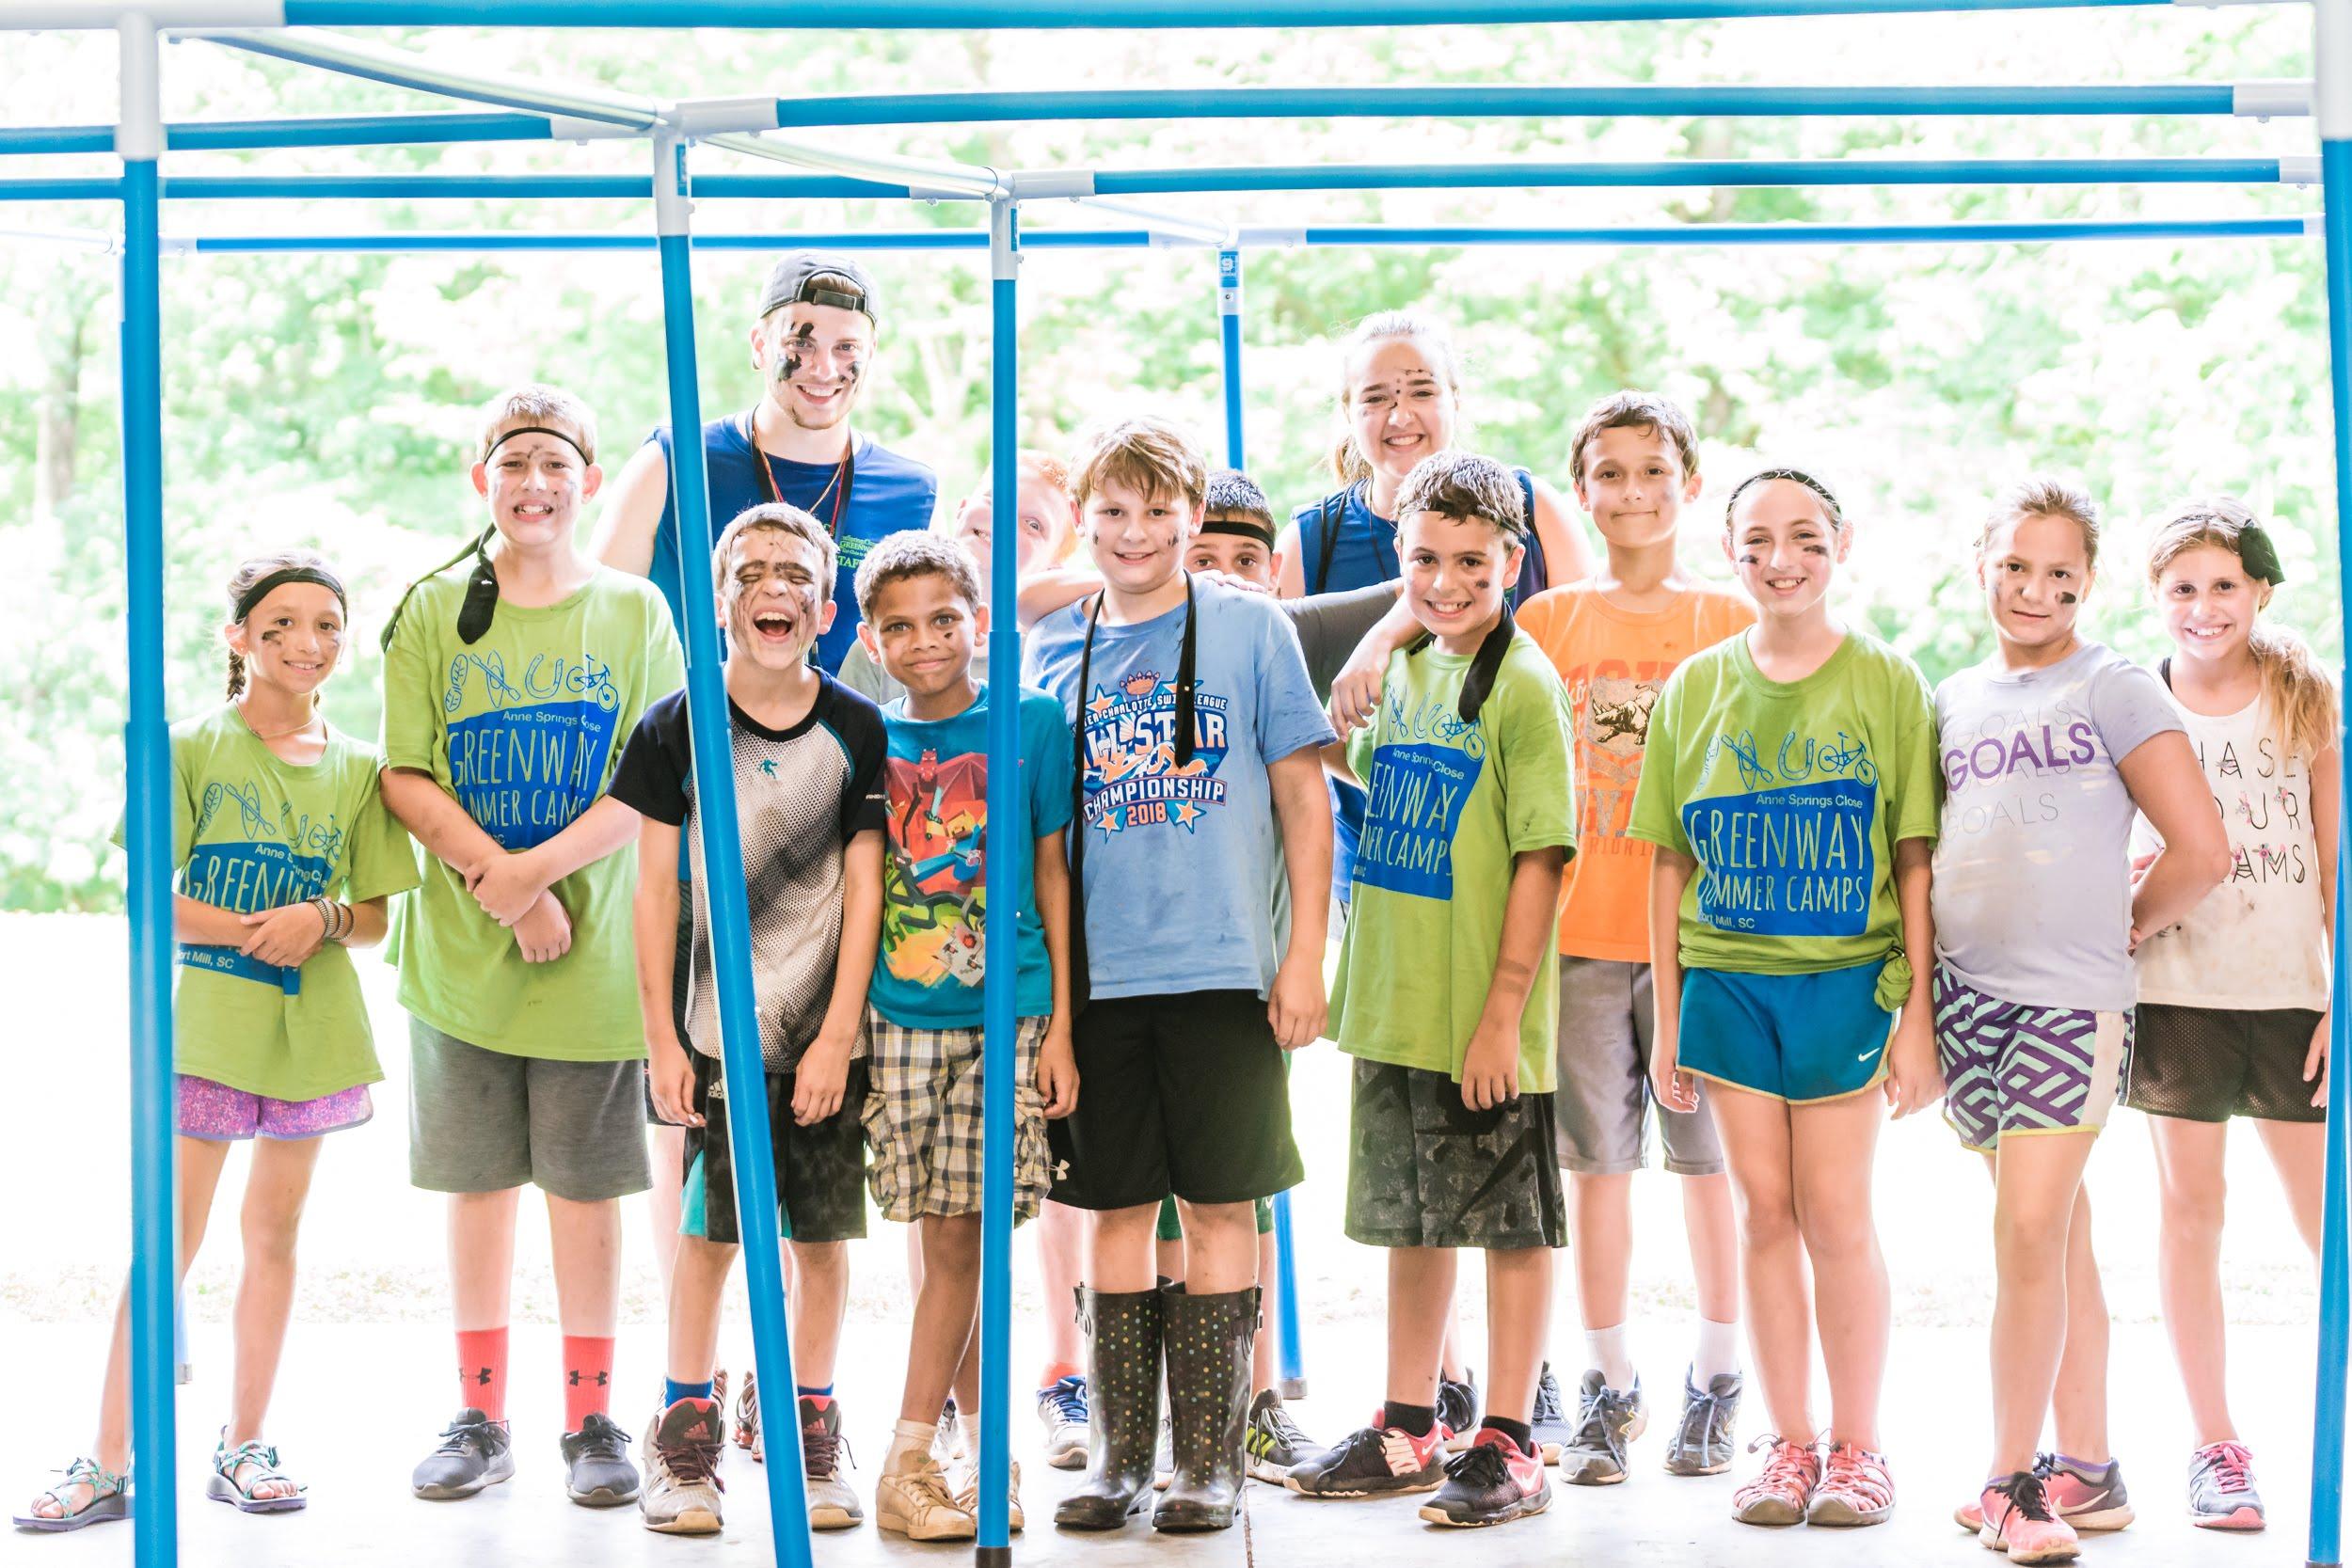 ASCGreenway Summer Camp July 13-442.jpg